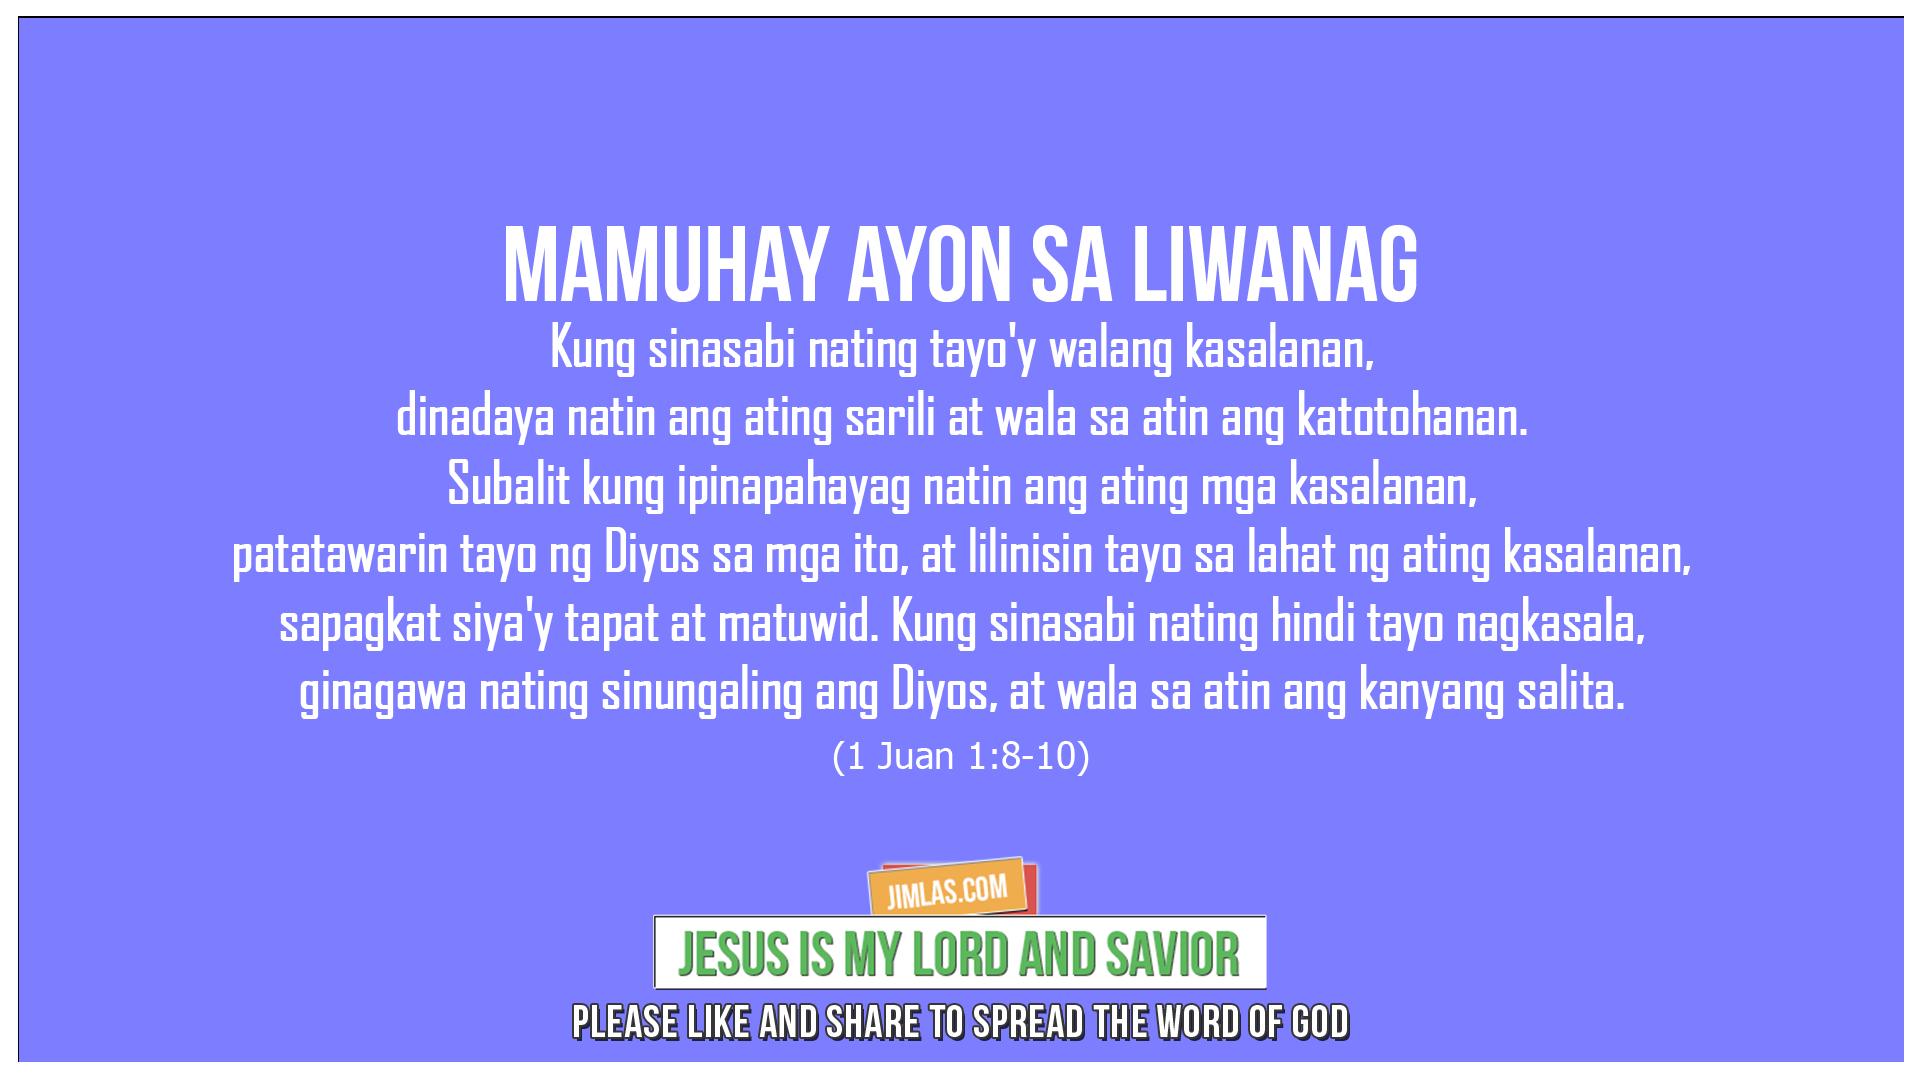 1 Juan 1:8-10, 1 Juan 1:8-10